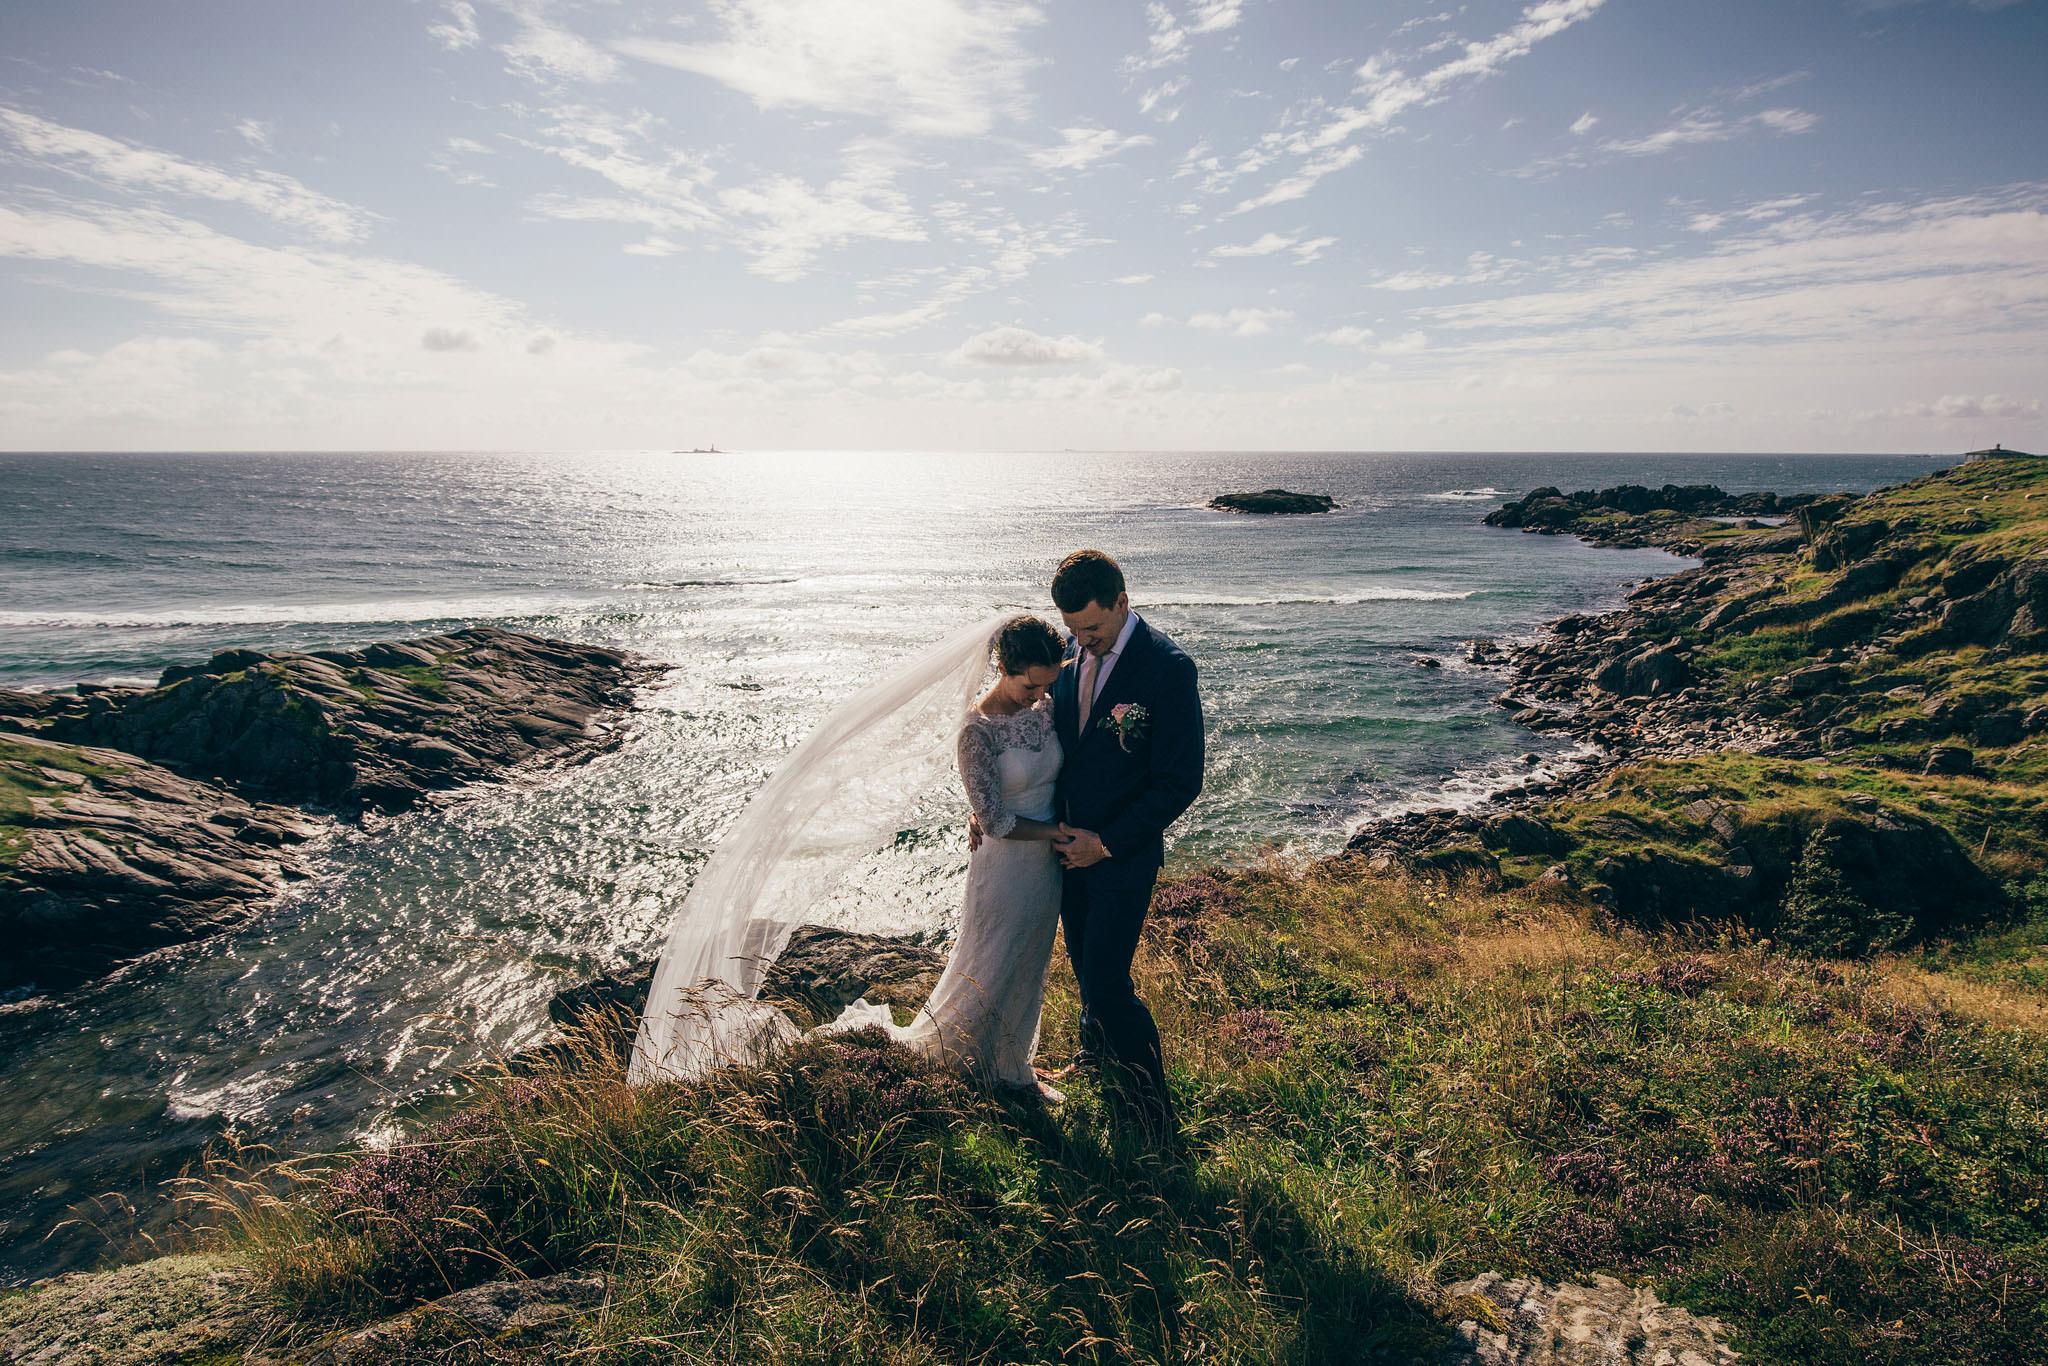 Norway+wedding+photographer+elopement+pre+wedding+Casey+Arneson-94.jpg